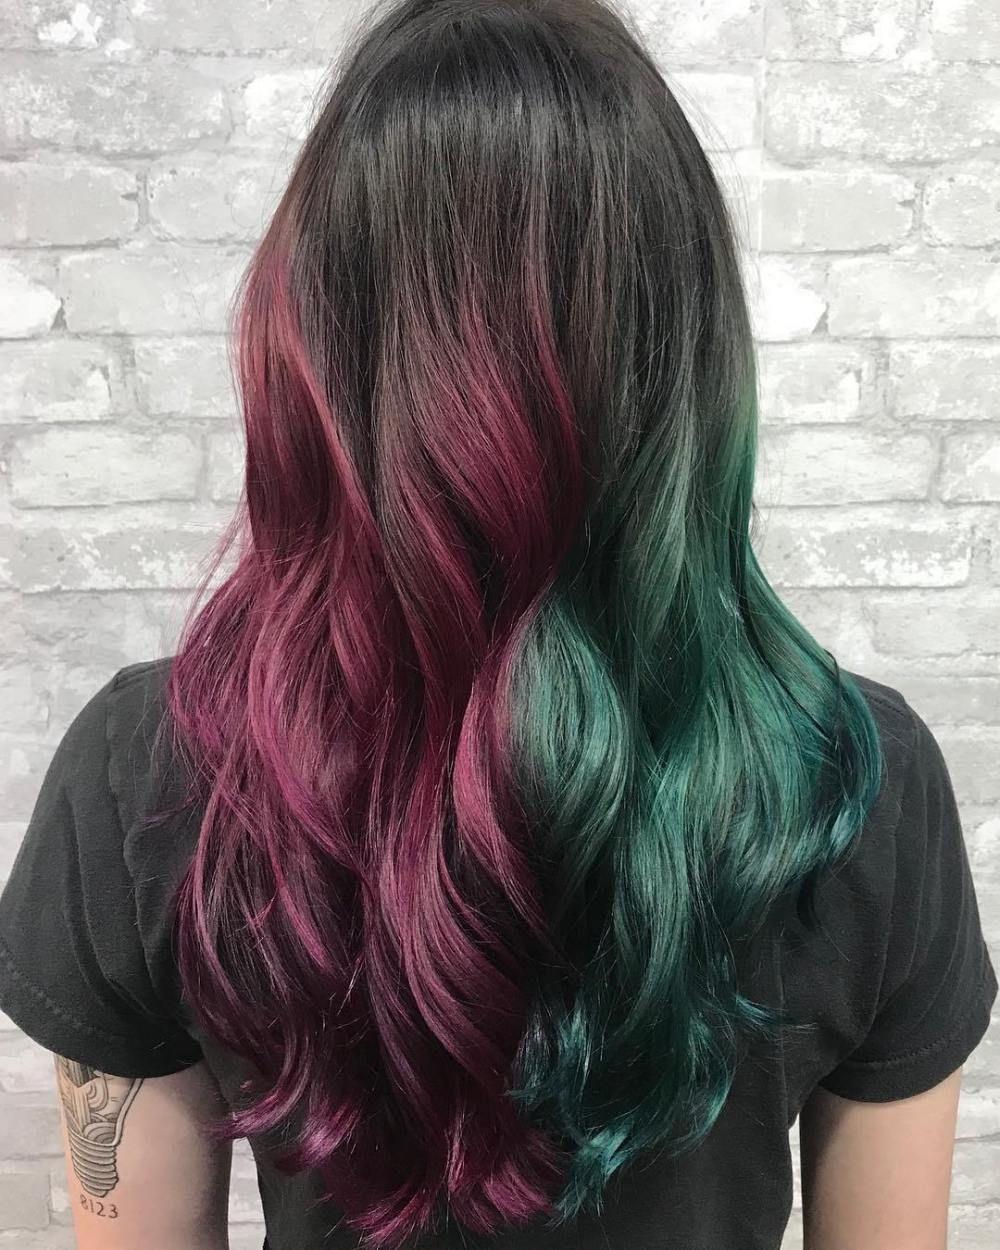 7 Badass Split Hair Color Ideas And Tips Based On My Experience Half And Half Hair Split Dyed Hair Colored Hair Tips